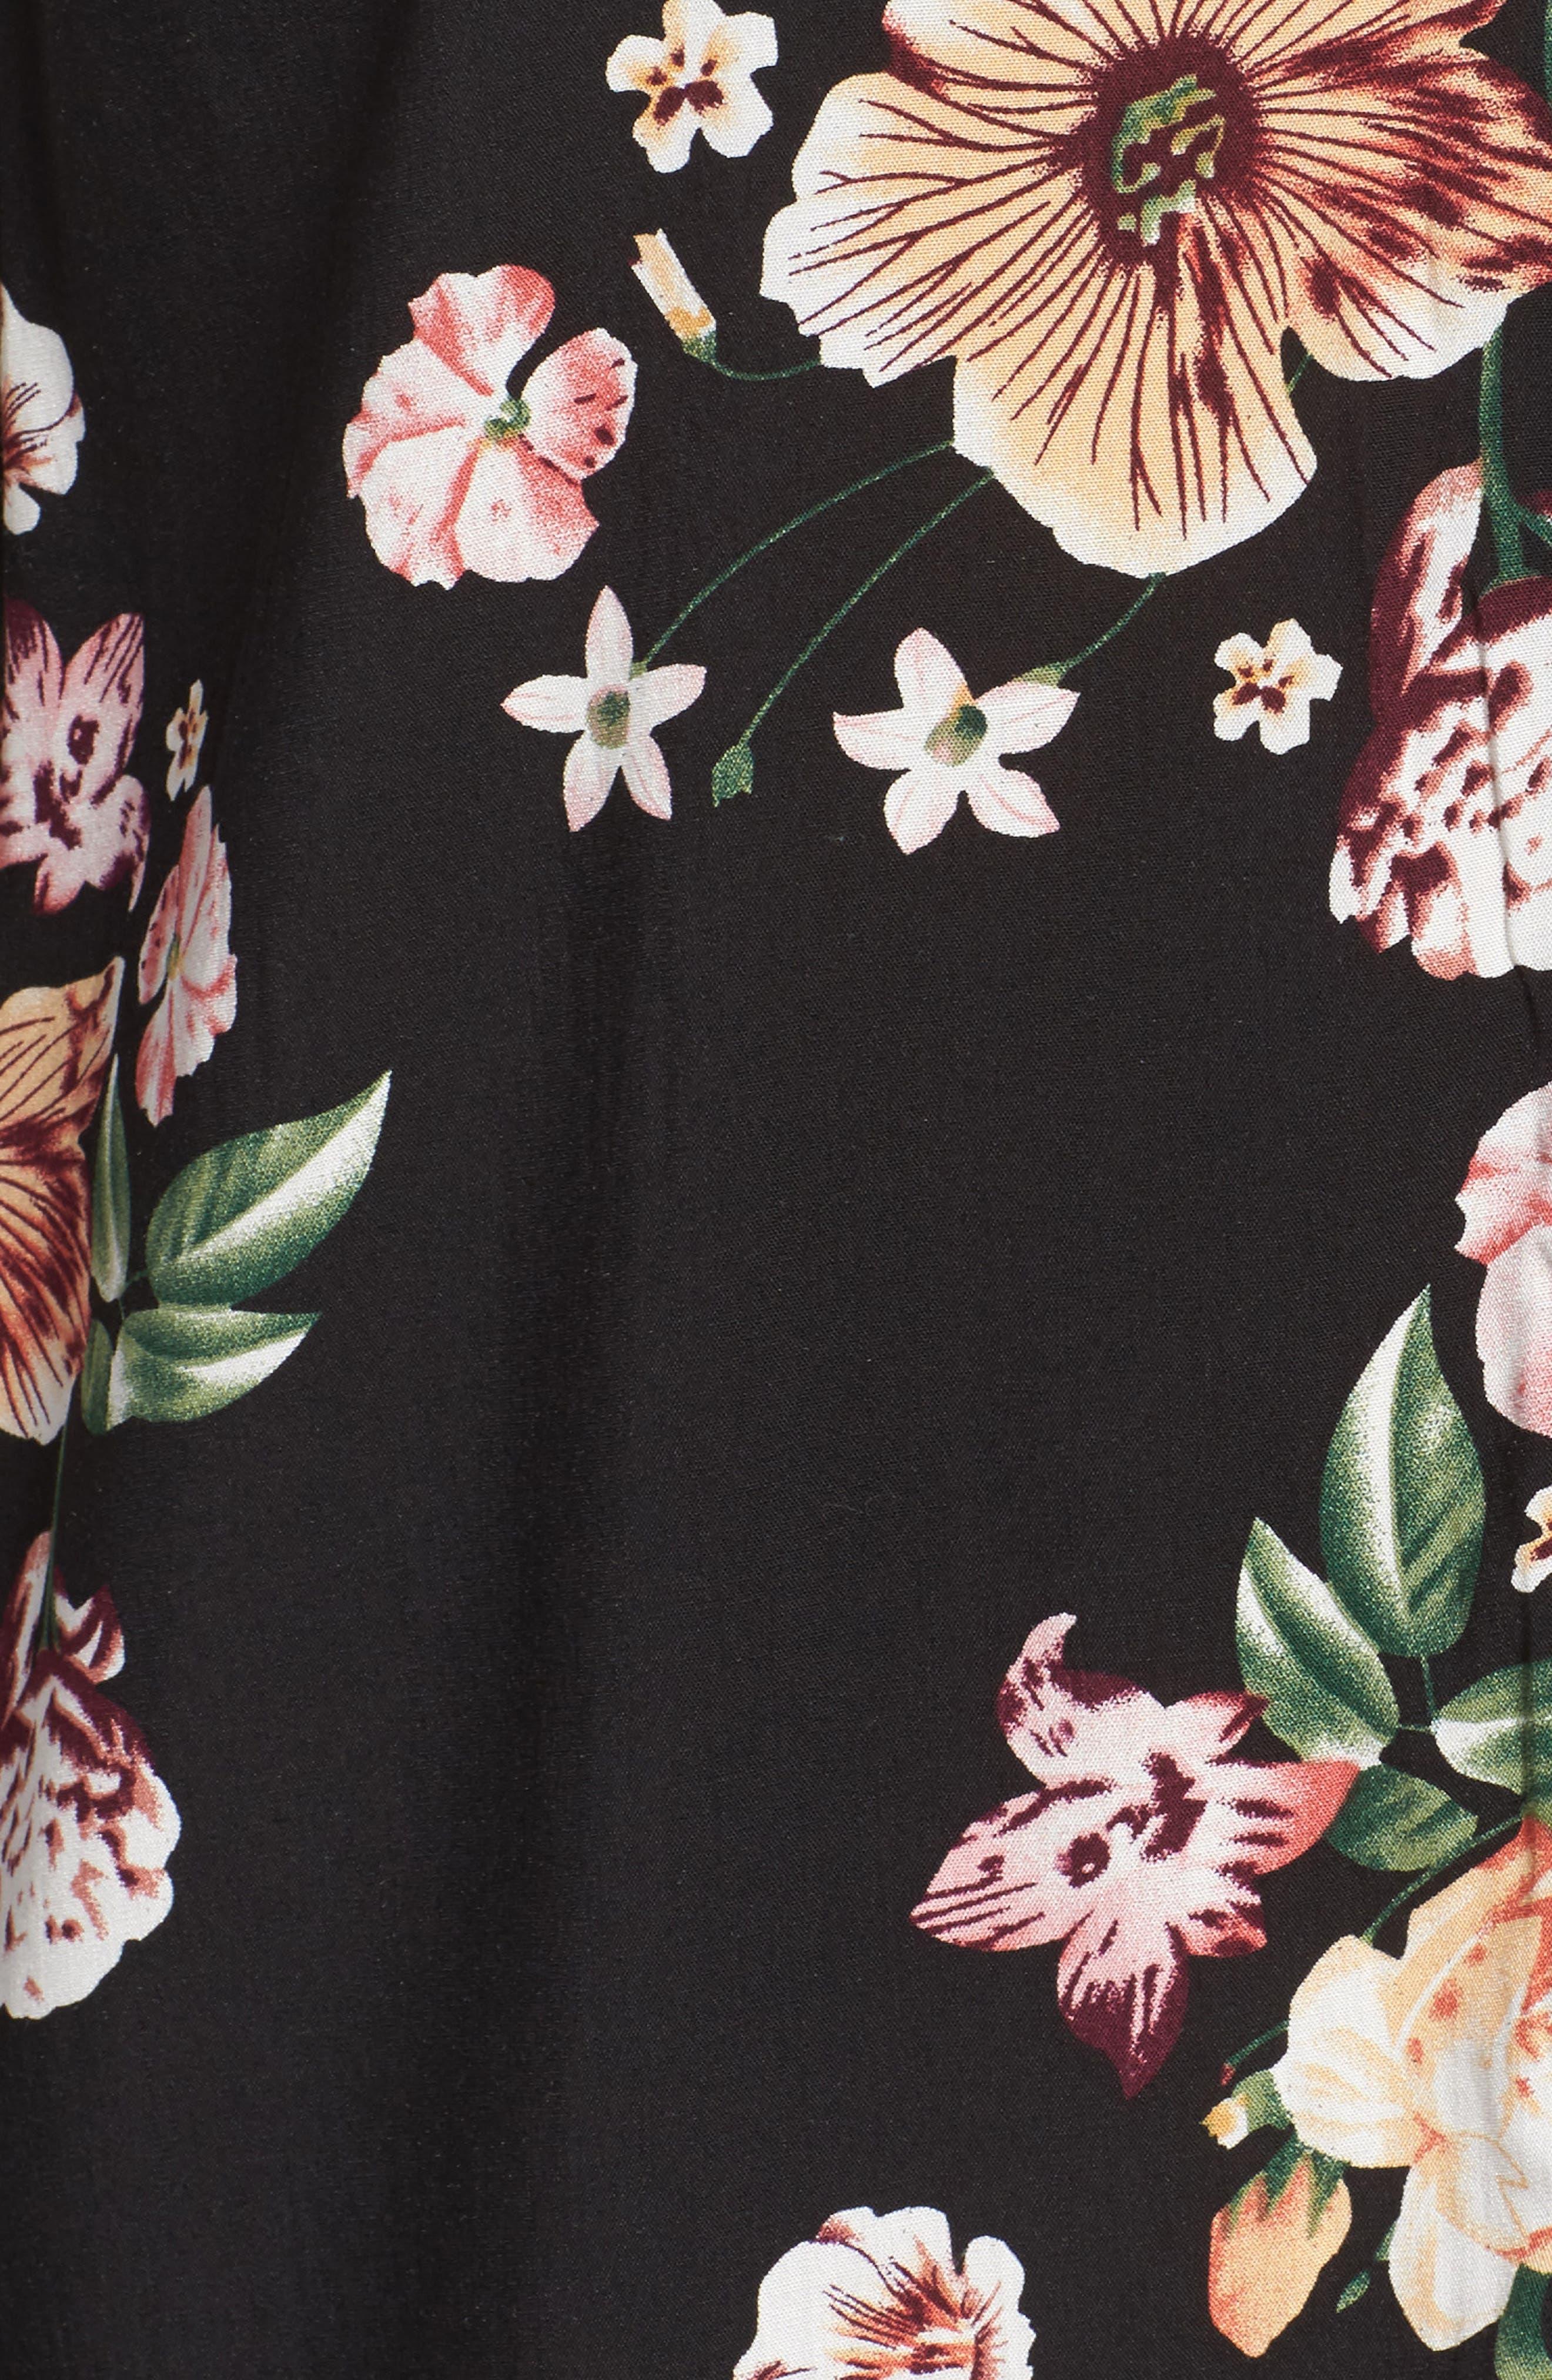 Bell Sleeve Floral Shift Dress,                             Alternate thumbnail 5, color,                             Black Tropic Flower